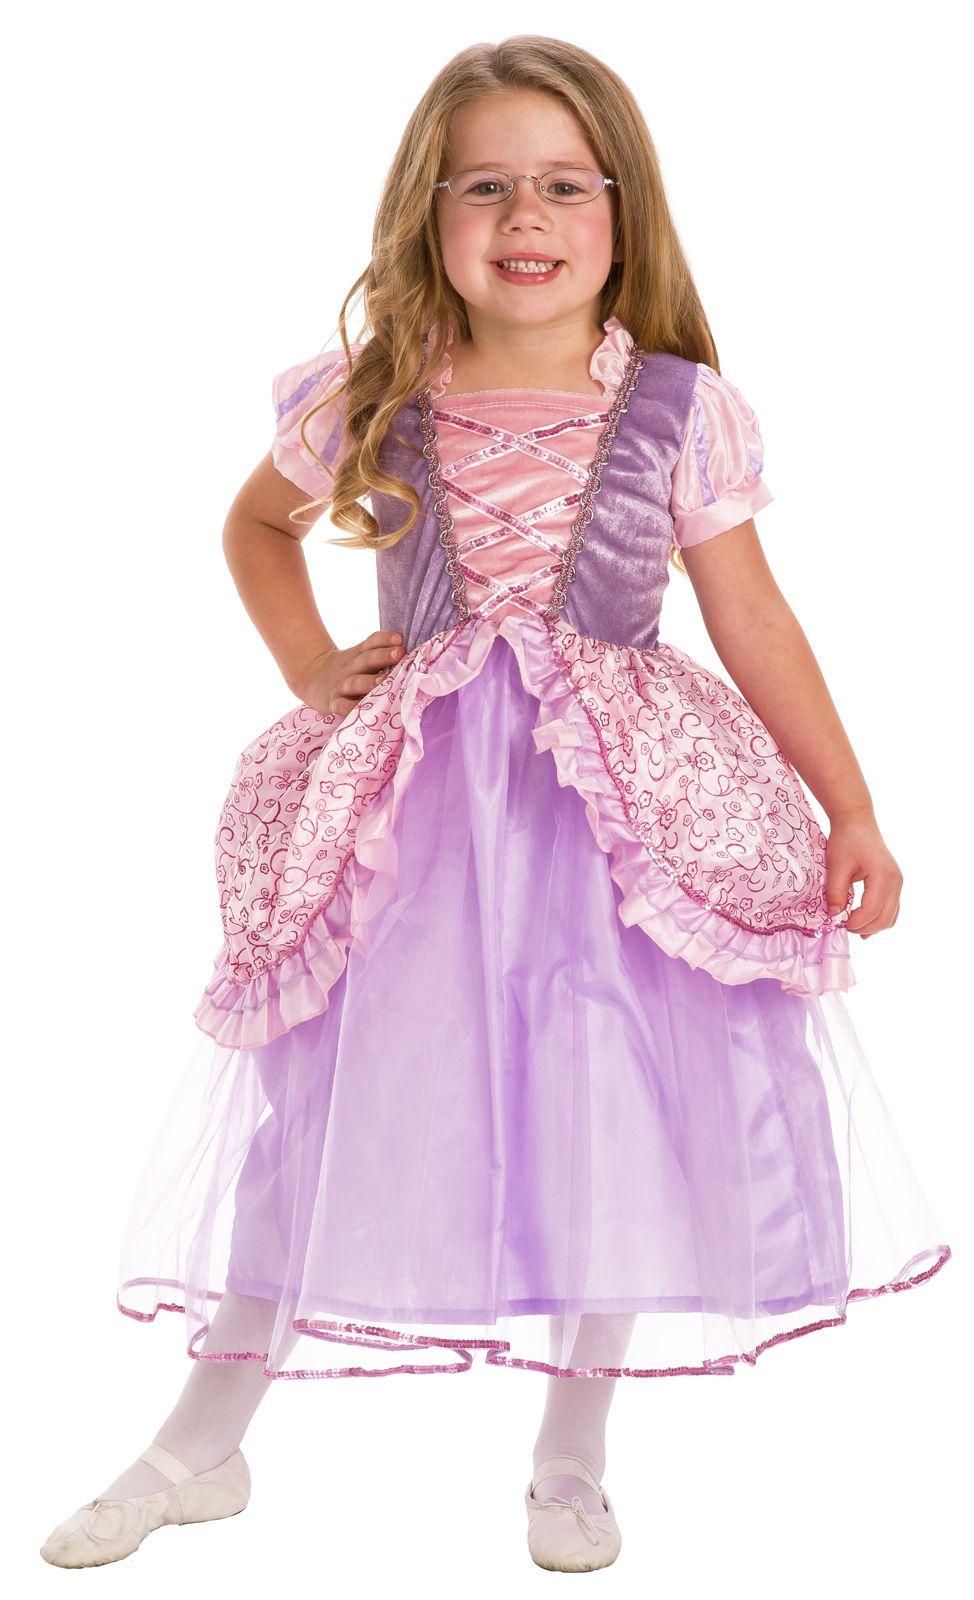 FANCY Rapunzel Dress Up Costume | Princess Party or Dress up Stuff ...